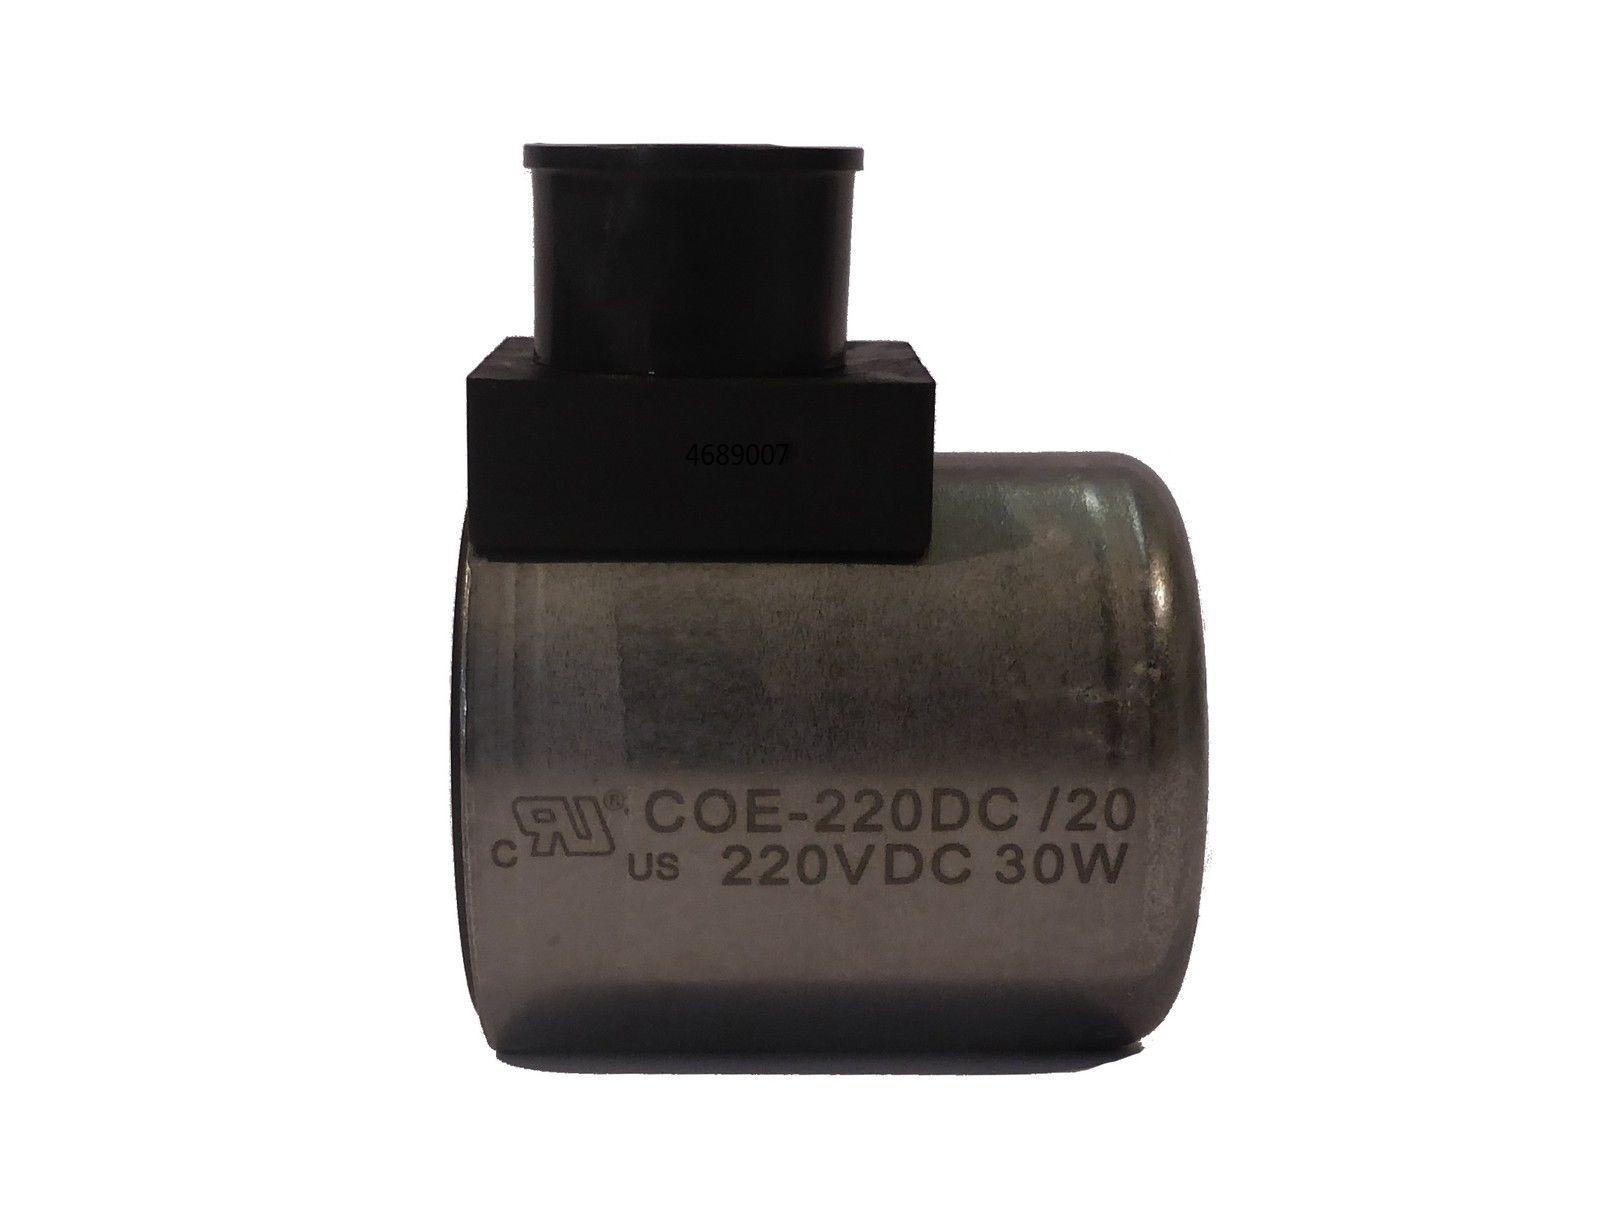 Atos SP-COE-220DC imán Spule Hydraulik Ventil bobina de válvula de solenoide